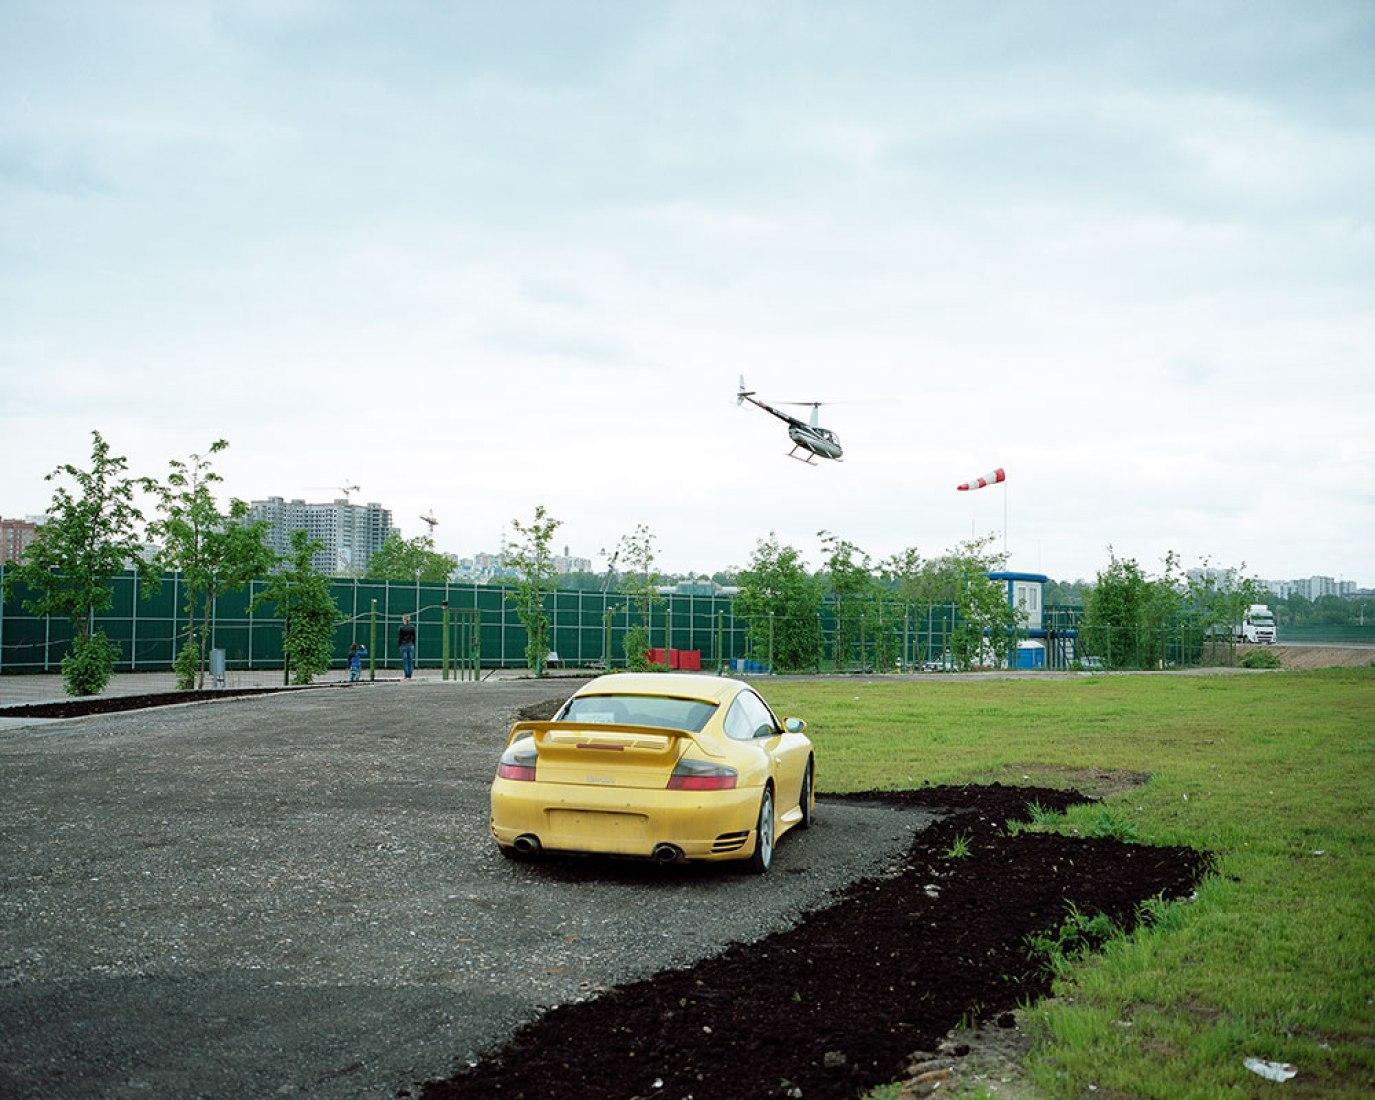 A Model for a City by Petr Antonov